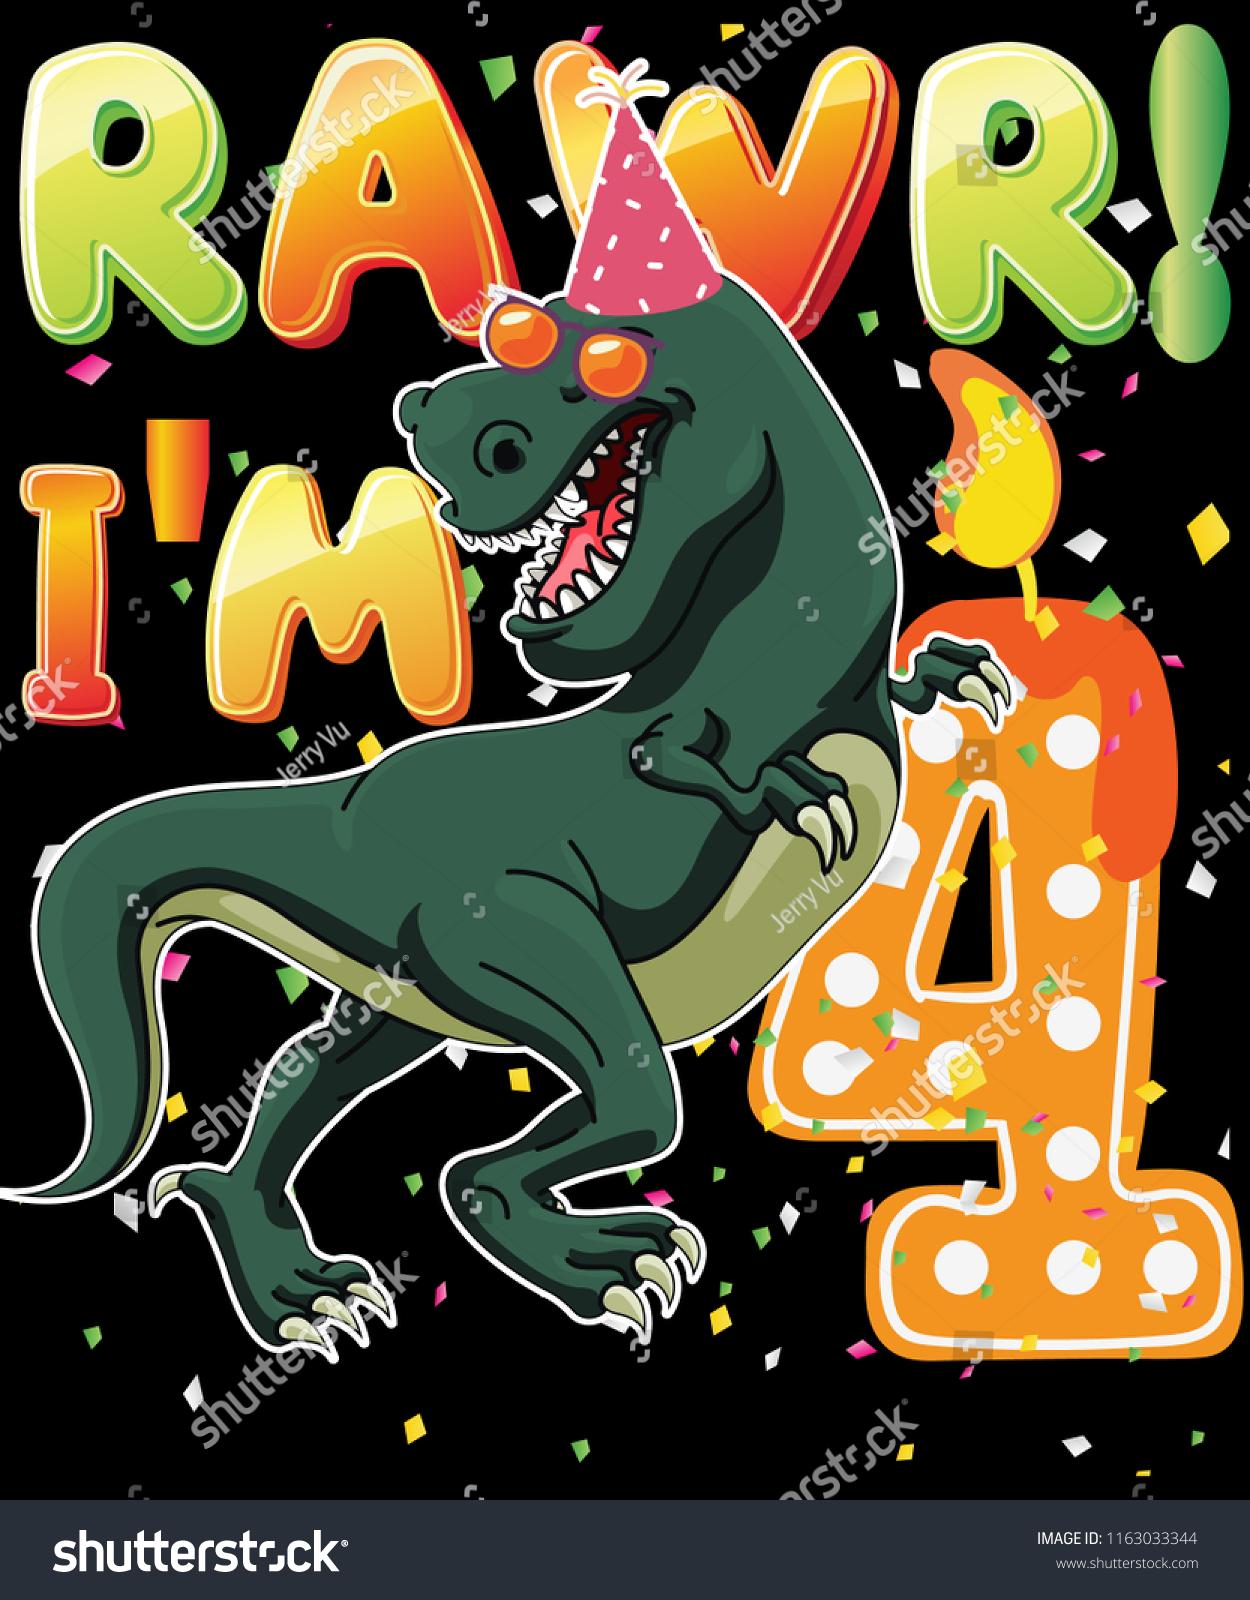 Dinosaur Birthday Shirt 4th Years Old Rawr Im 4 T Vector Graphic